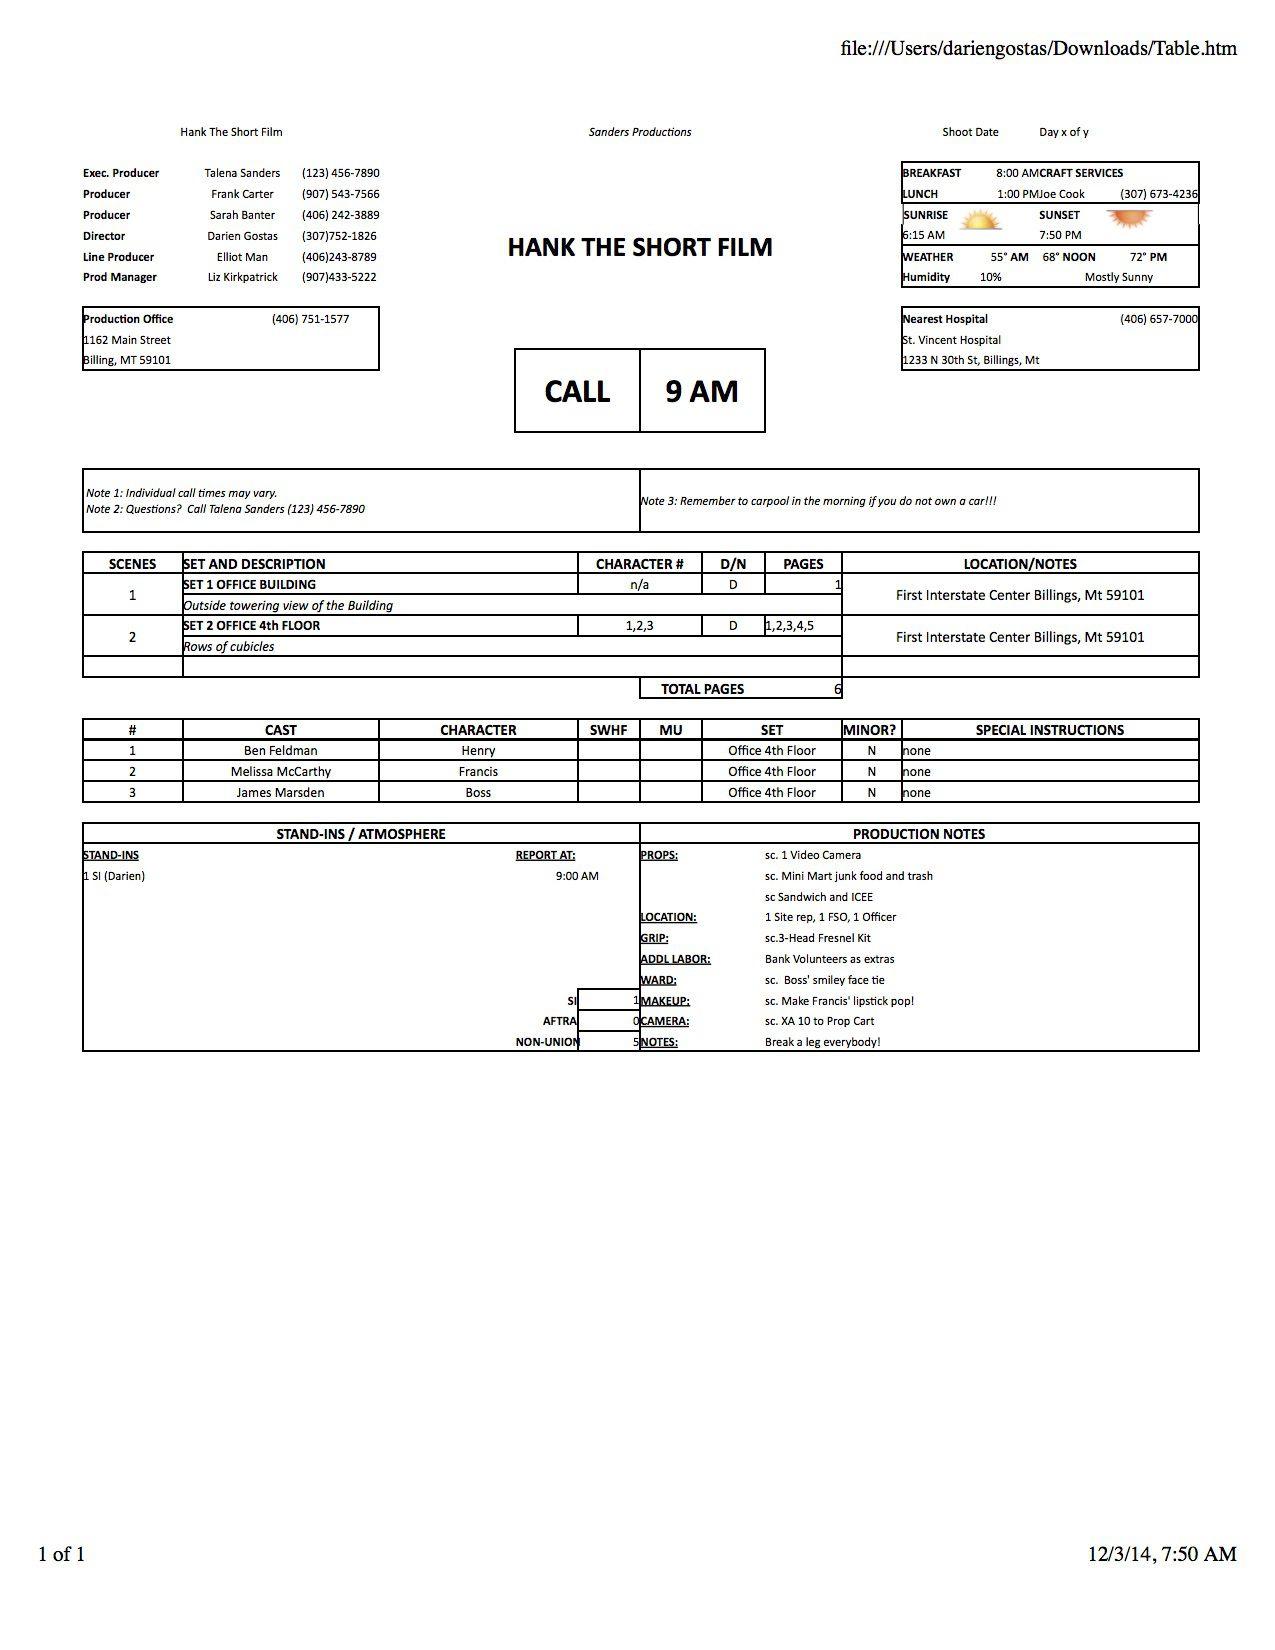 005 Wondrou Film Call Sheet Sample Photo  Template Download Excel Google DocFull